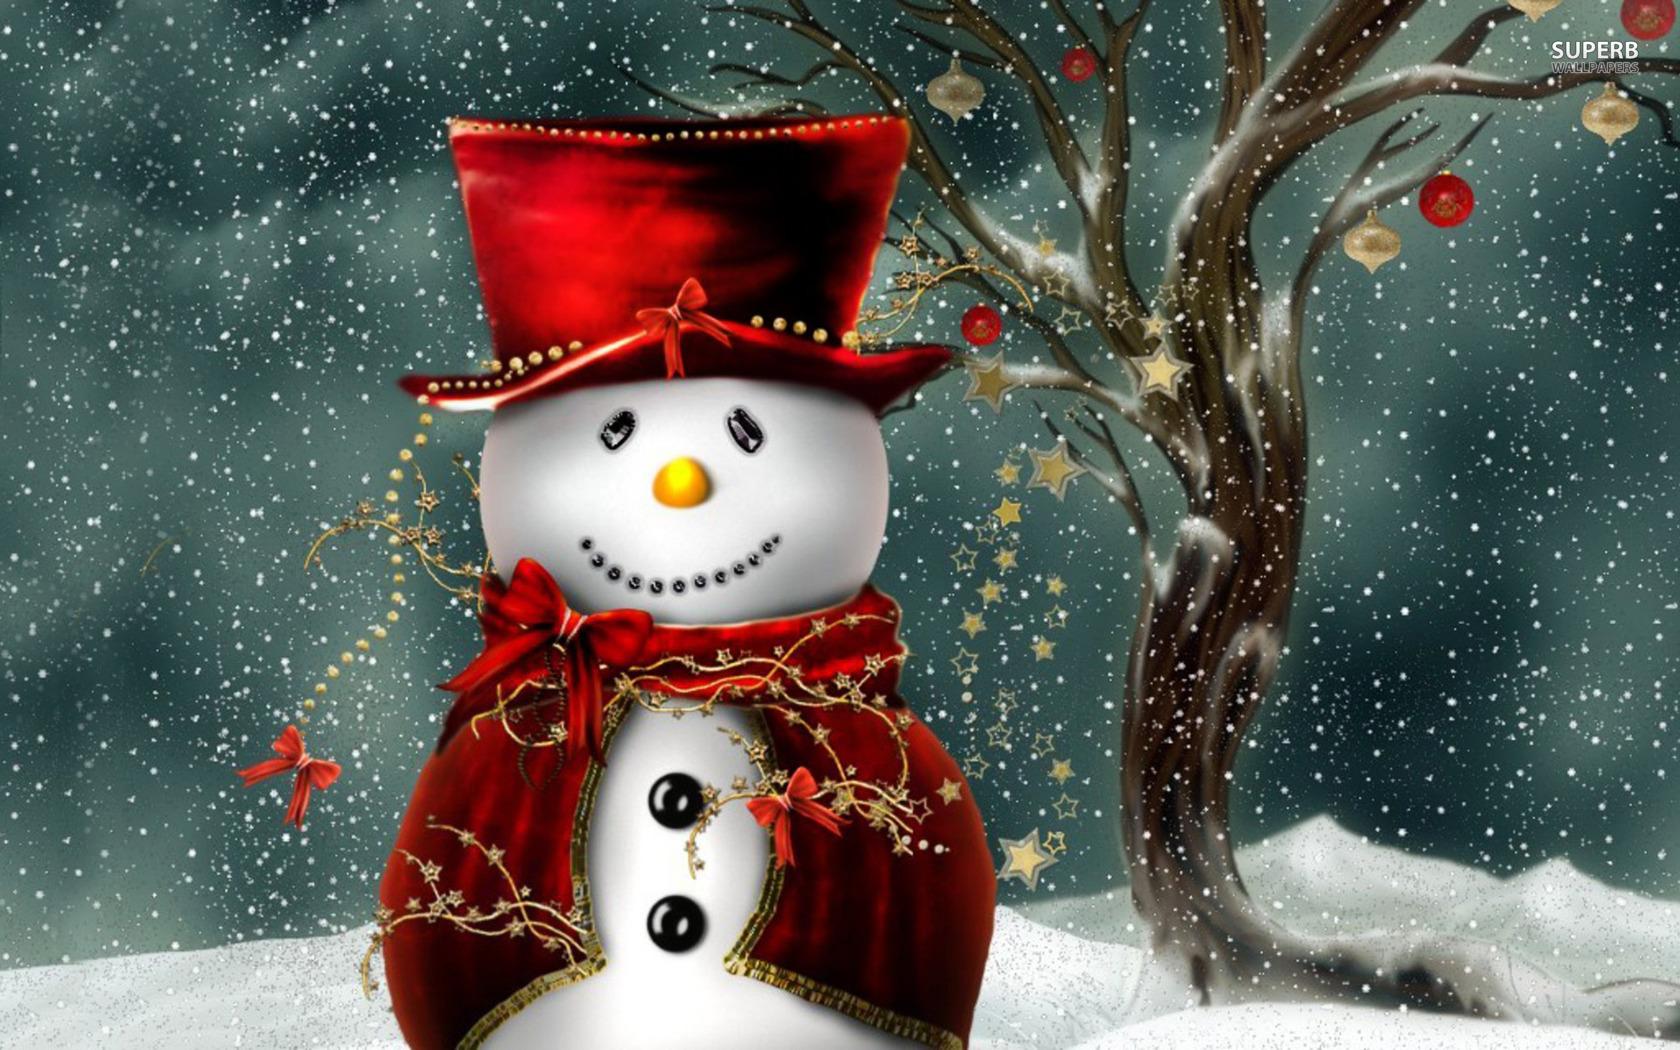 Snowman wallpaper 1680x1050